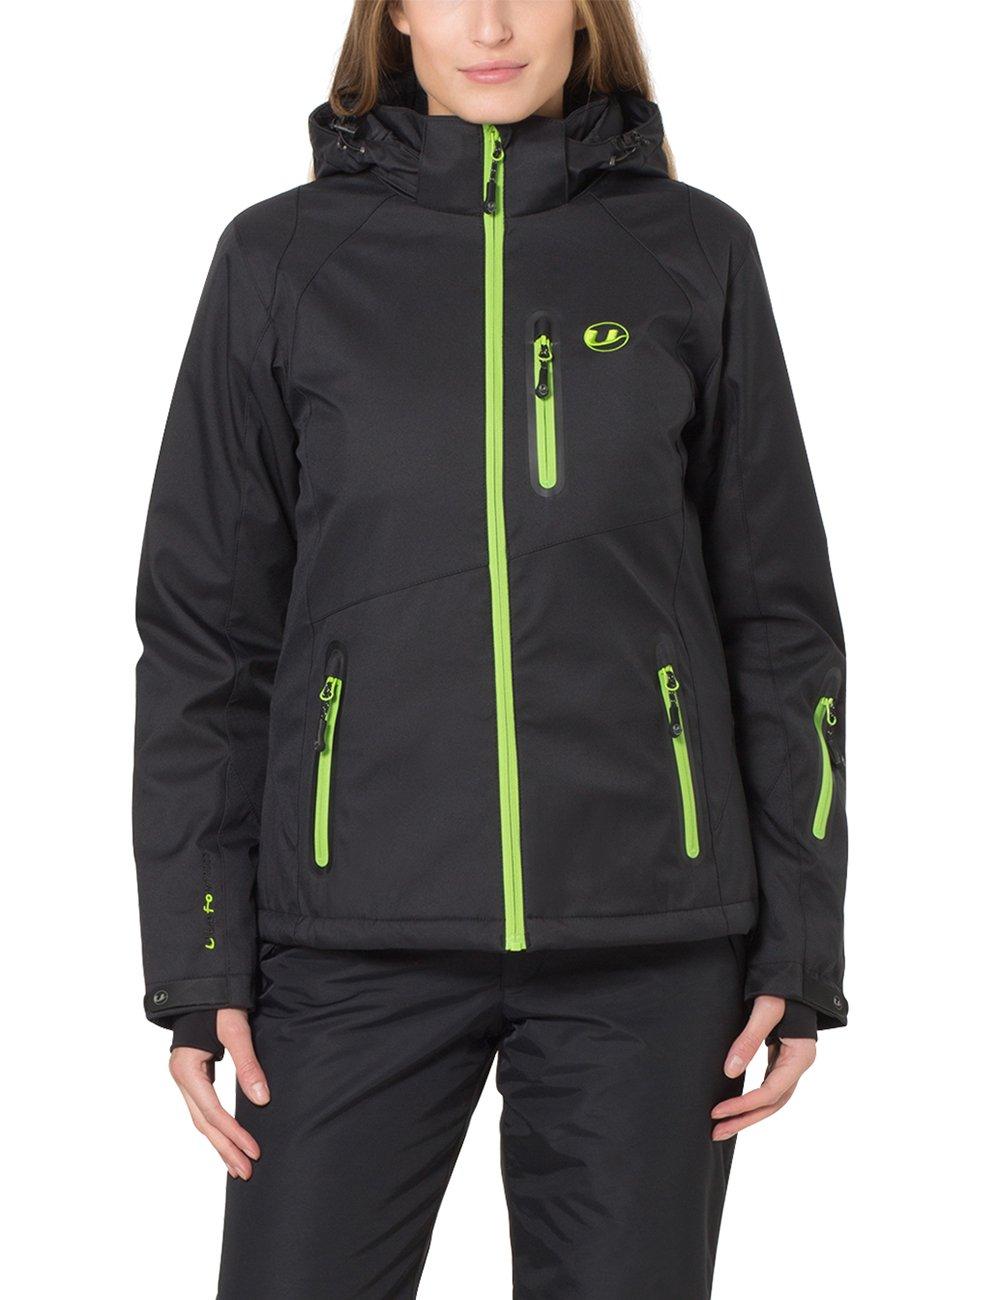 Noir Vert XL Ultrasport Softshell Veste Serfaus avec UltrafFaible por  Femme